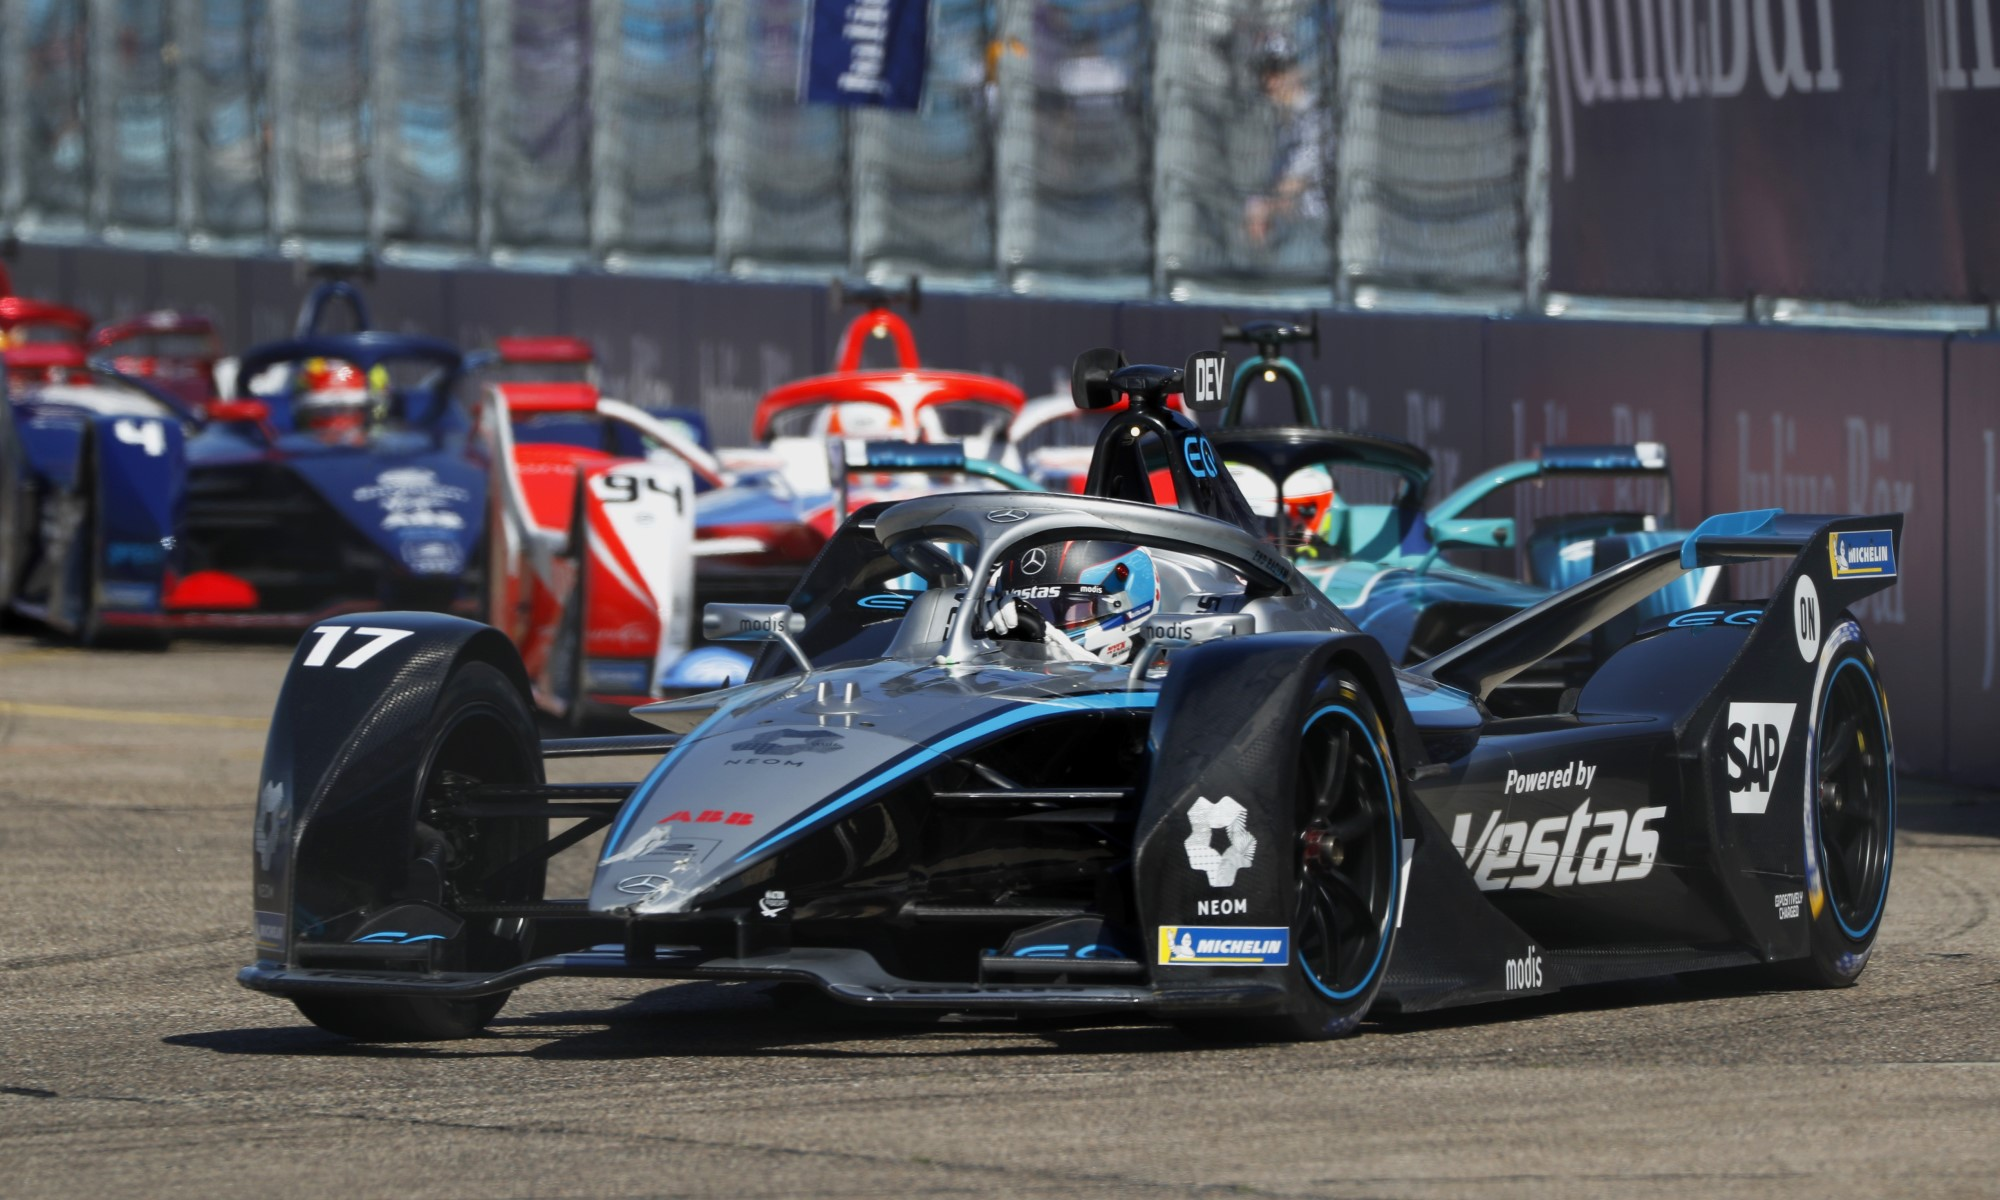 Double Formula E World Champions